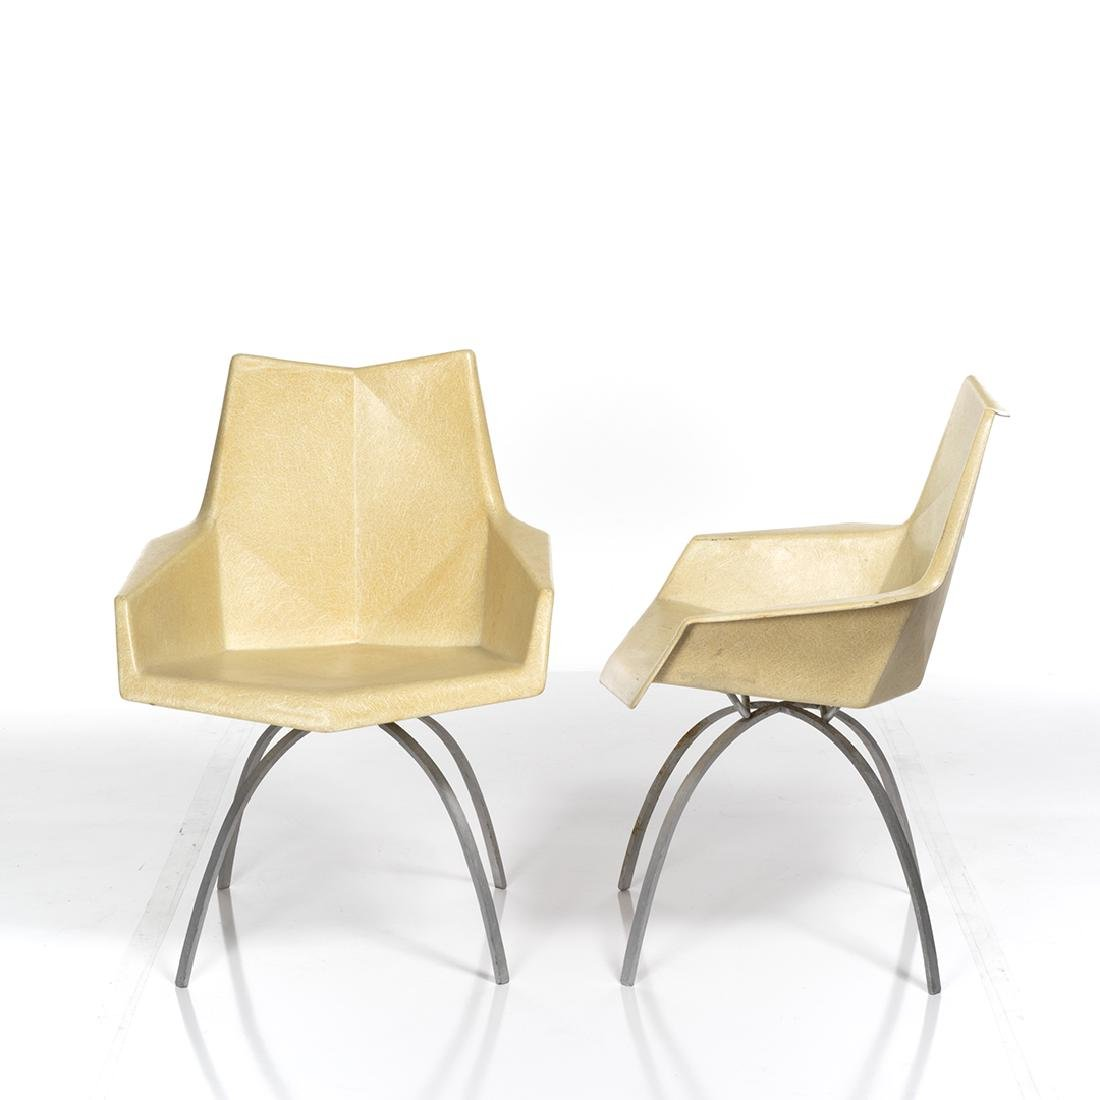 Paul McCobb Origami Chairs (2) - 2